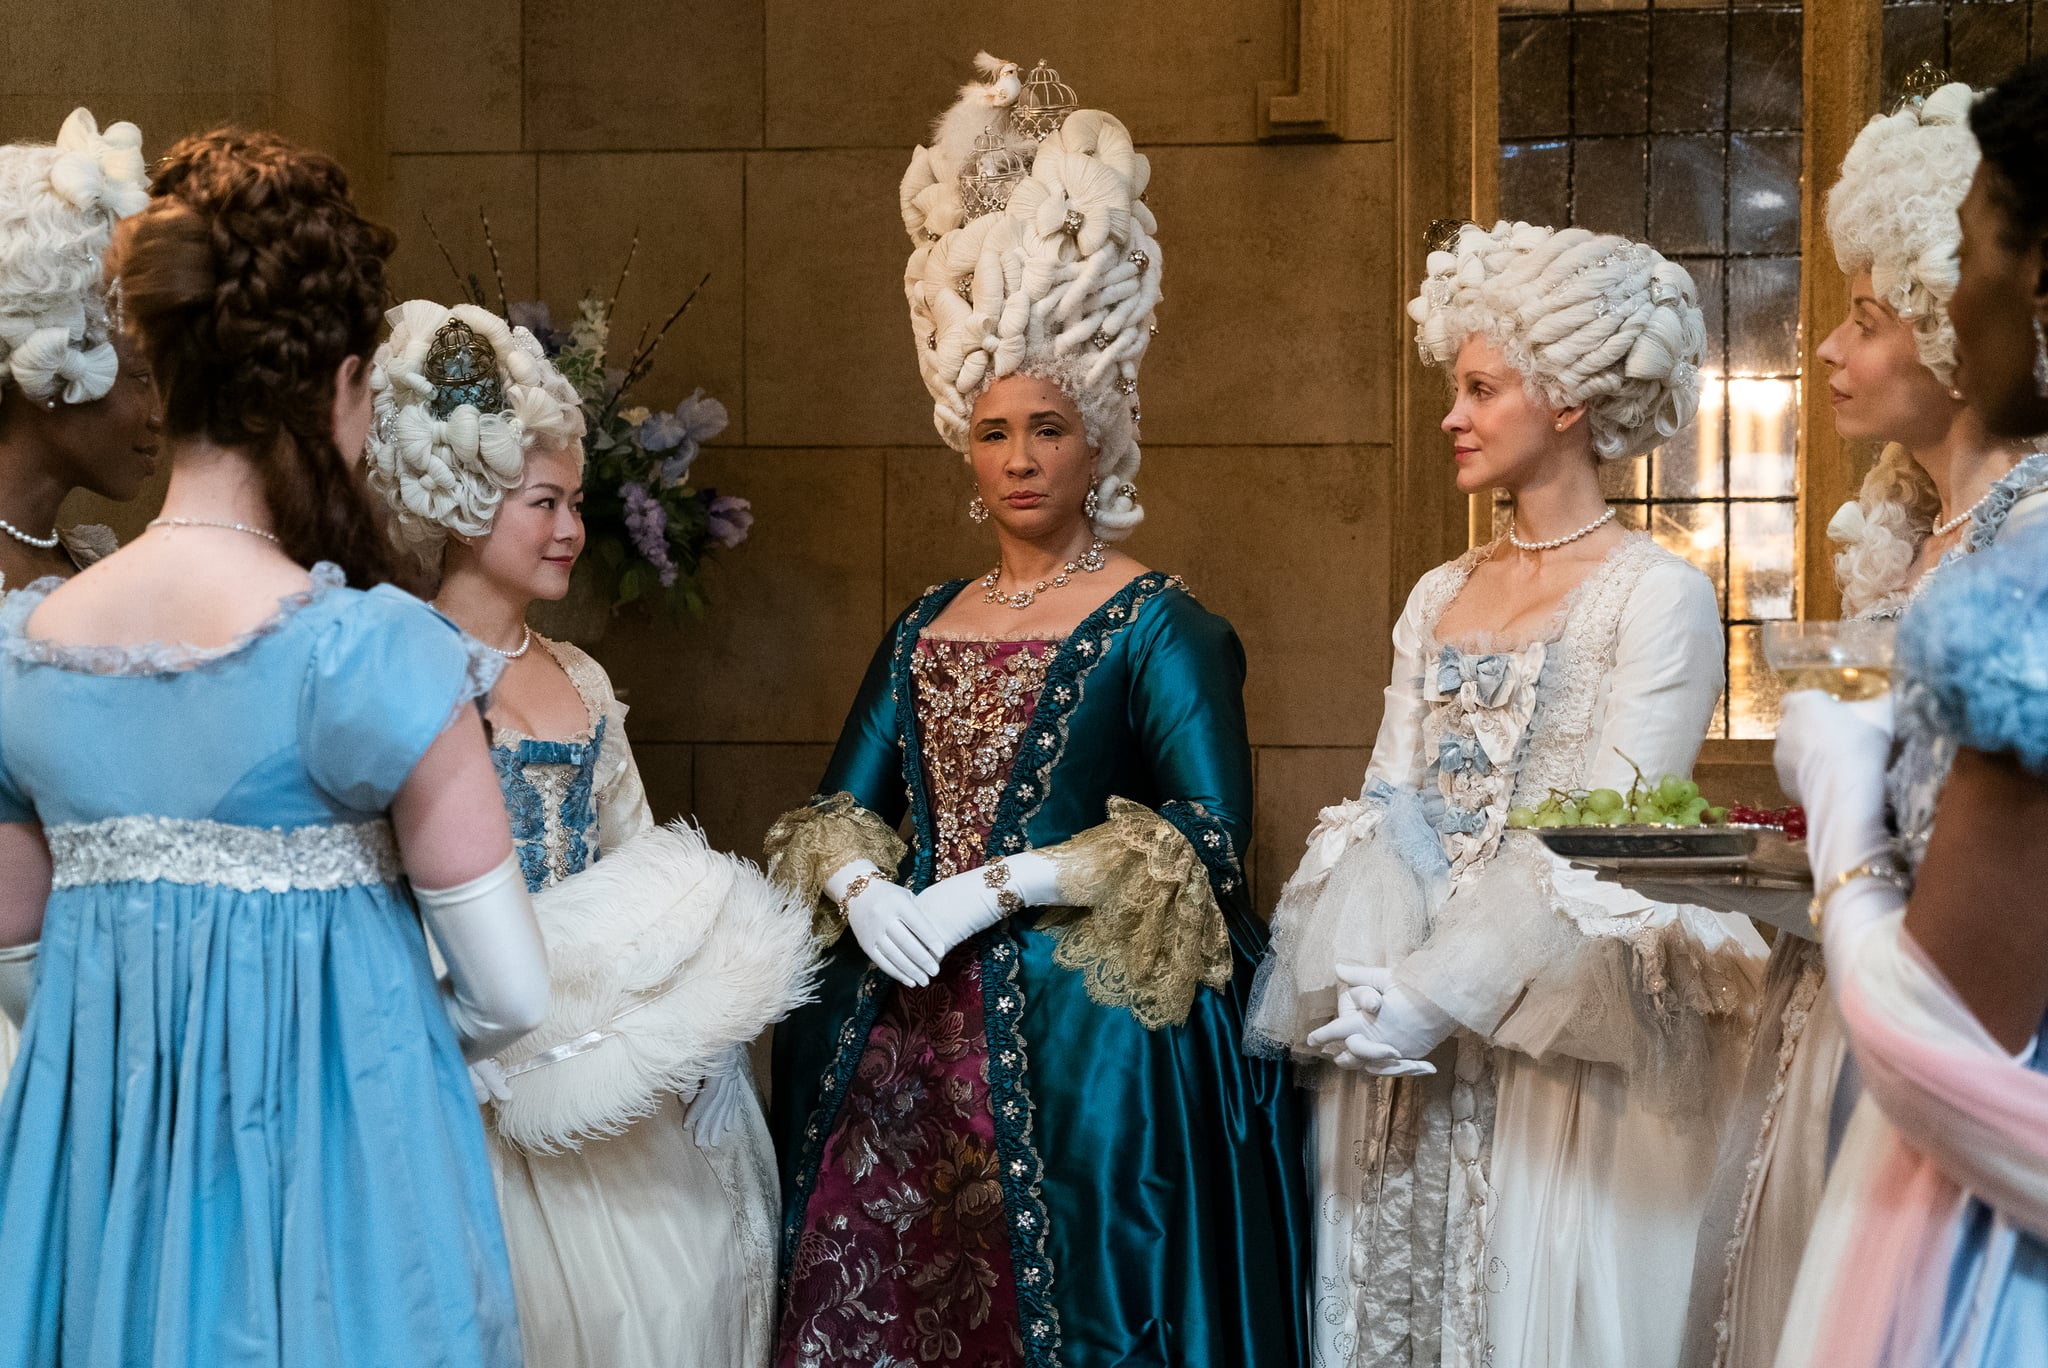 BRIDGERTON GOLDA ROSHEUVEL as QUEEN CHARLOTTE in episode 108 of BRIDGERTON Cr. LIAM DANIEL/NETFLIX  2020